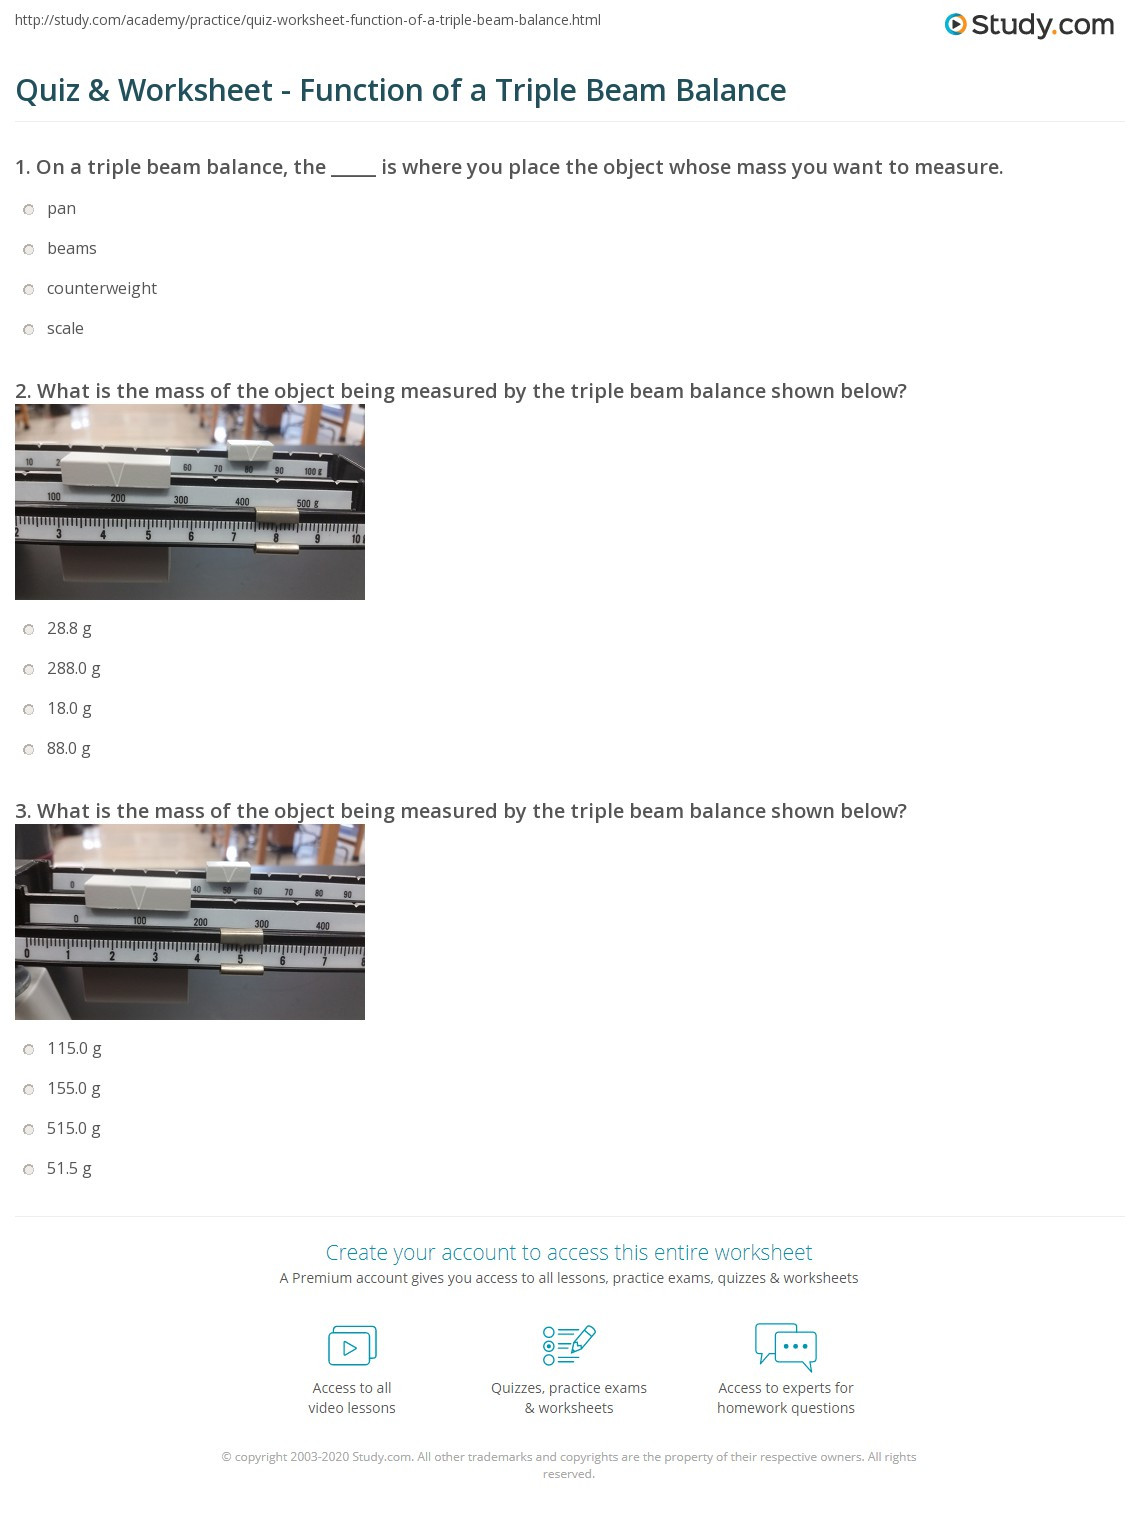 Triple Beam Balance Practice Worksheet Quiz & Worksheet Function Of A Triple Beam Balance